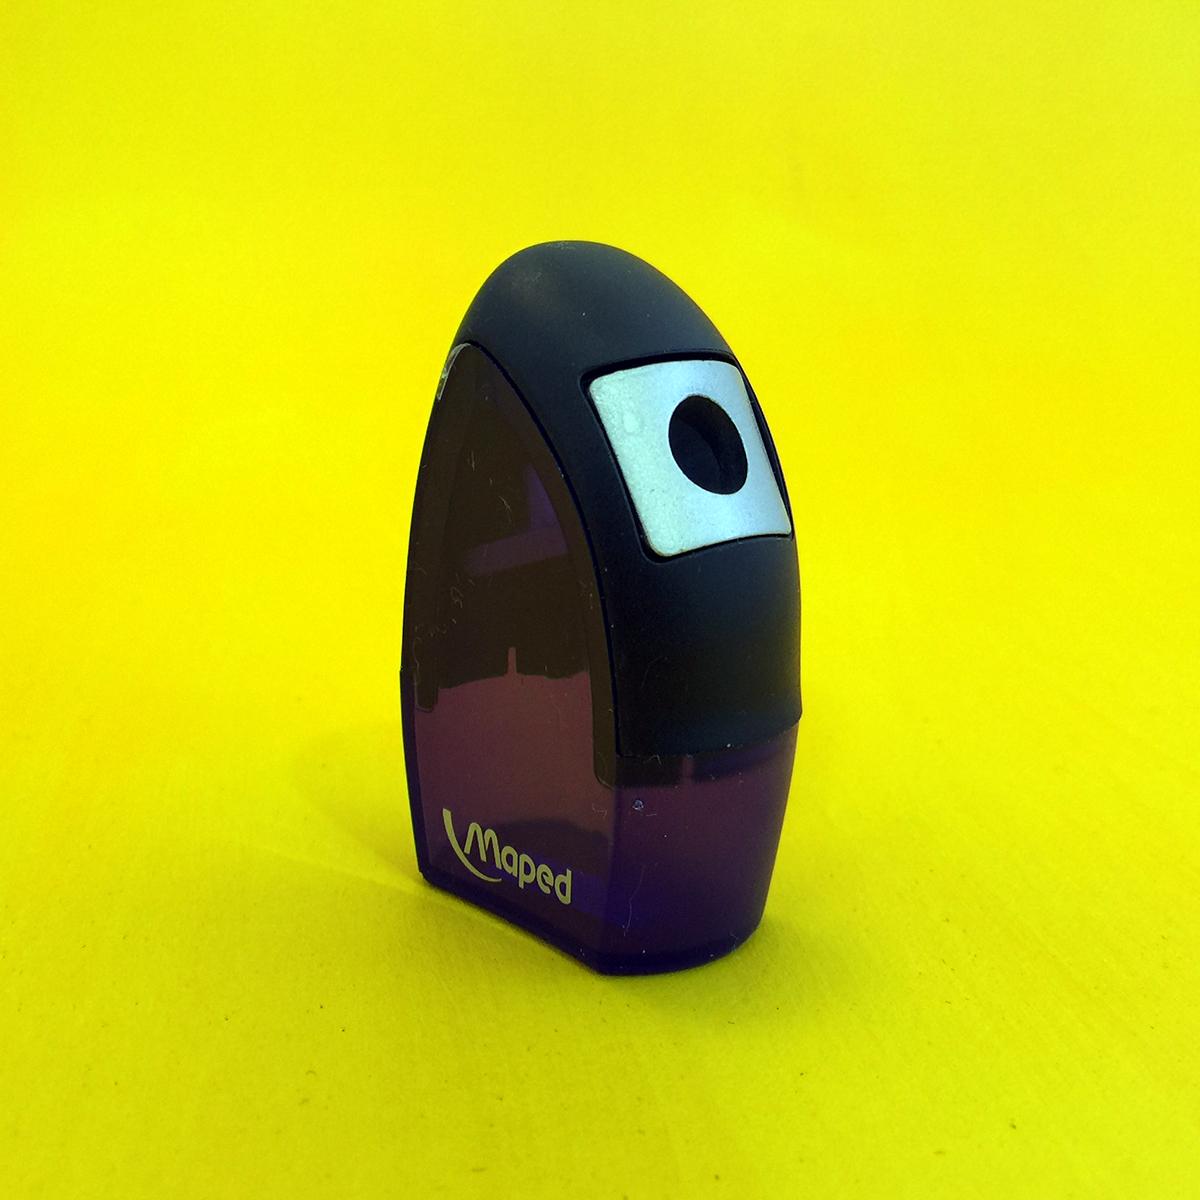 purplepencilsharpener